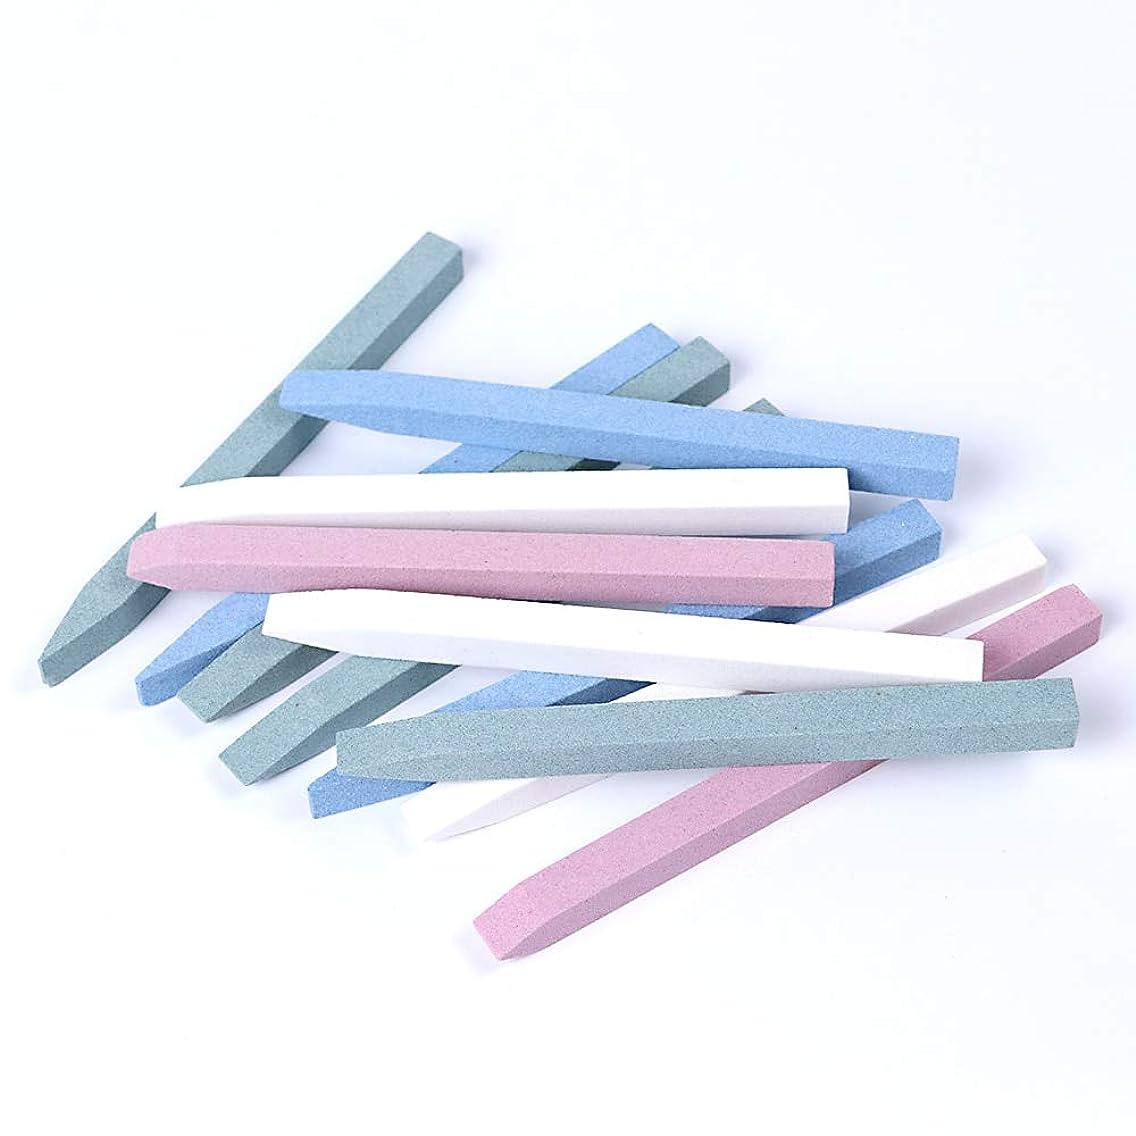 Nail File - 5pcs Nail Files Sponge Bffe Block Foam Pedice Accessoies Aow Sanding Pofessional Gel Polish Manice Tools Be1000 - By Arislux